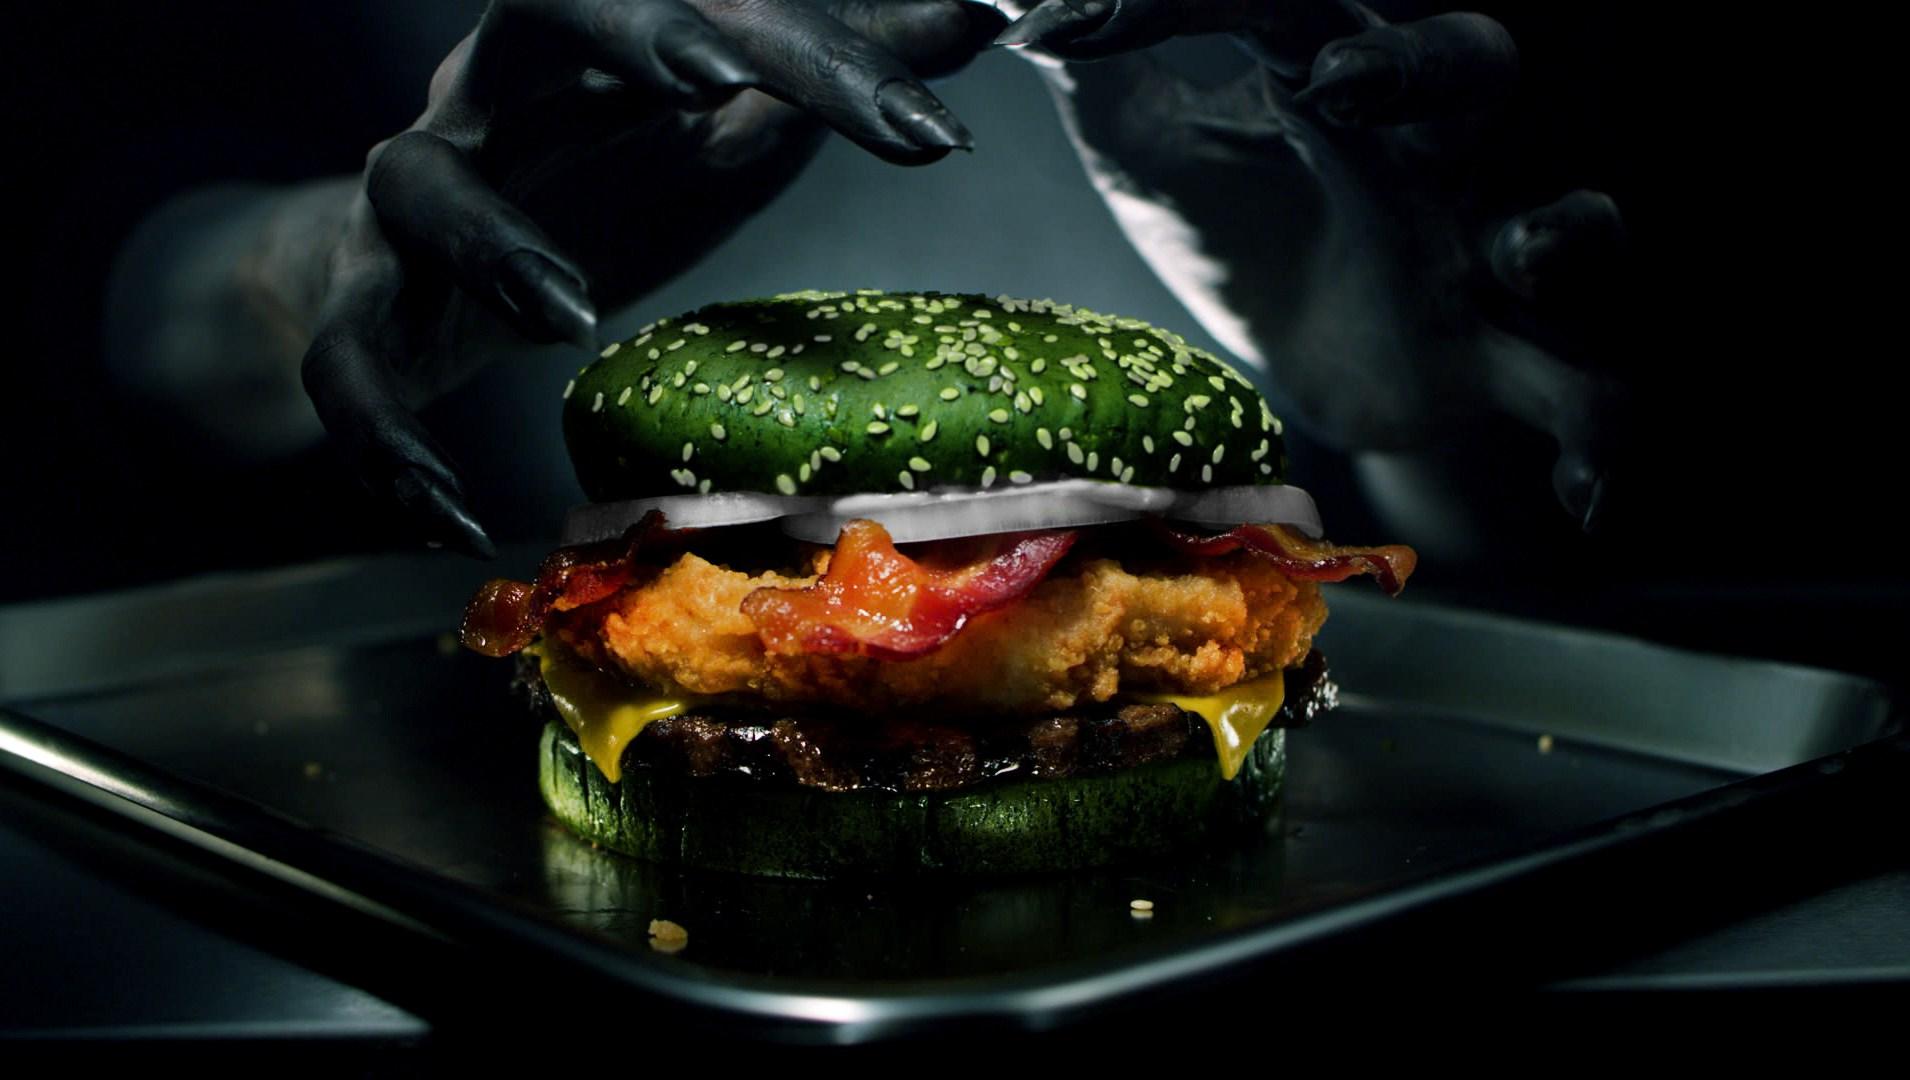 Burger King's Nightmare King Burger Has a Green Bun and Social Media Is Divided